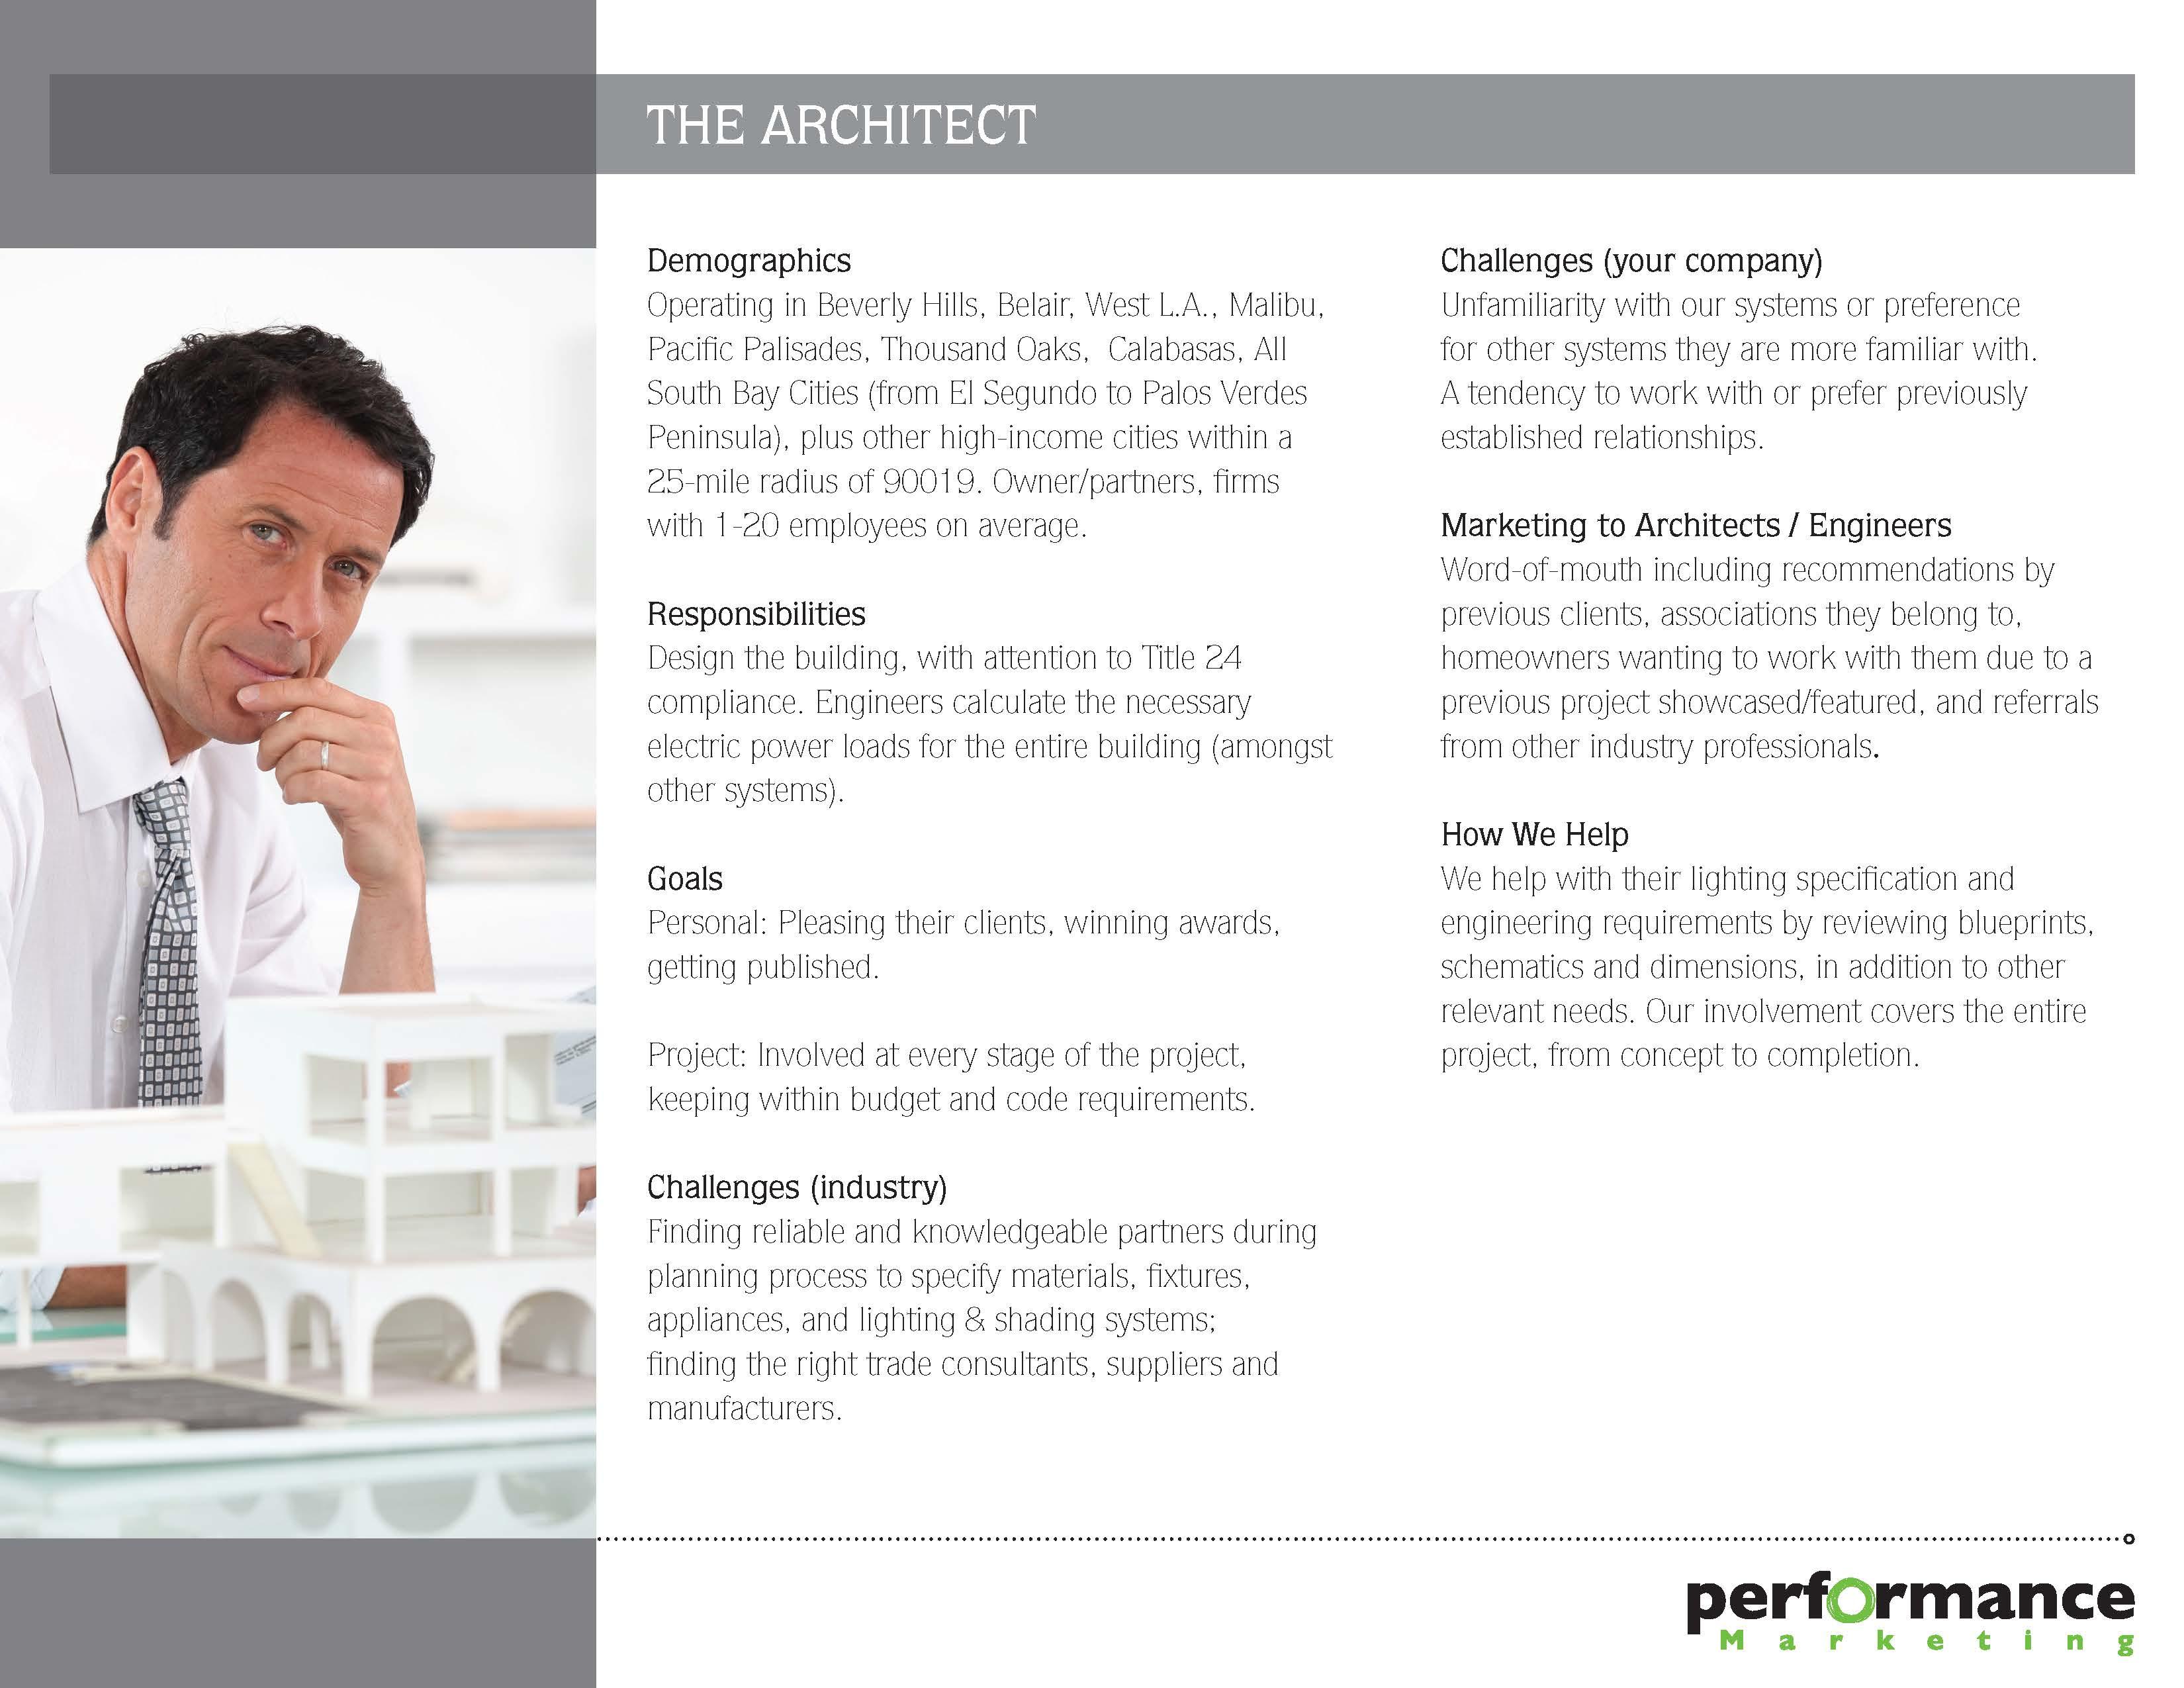 Generic Architect Persona